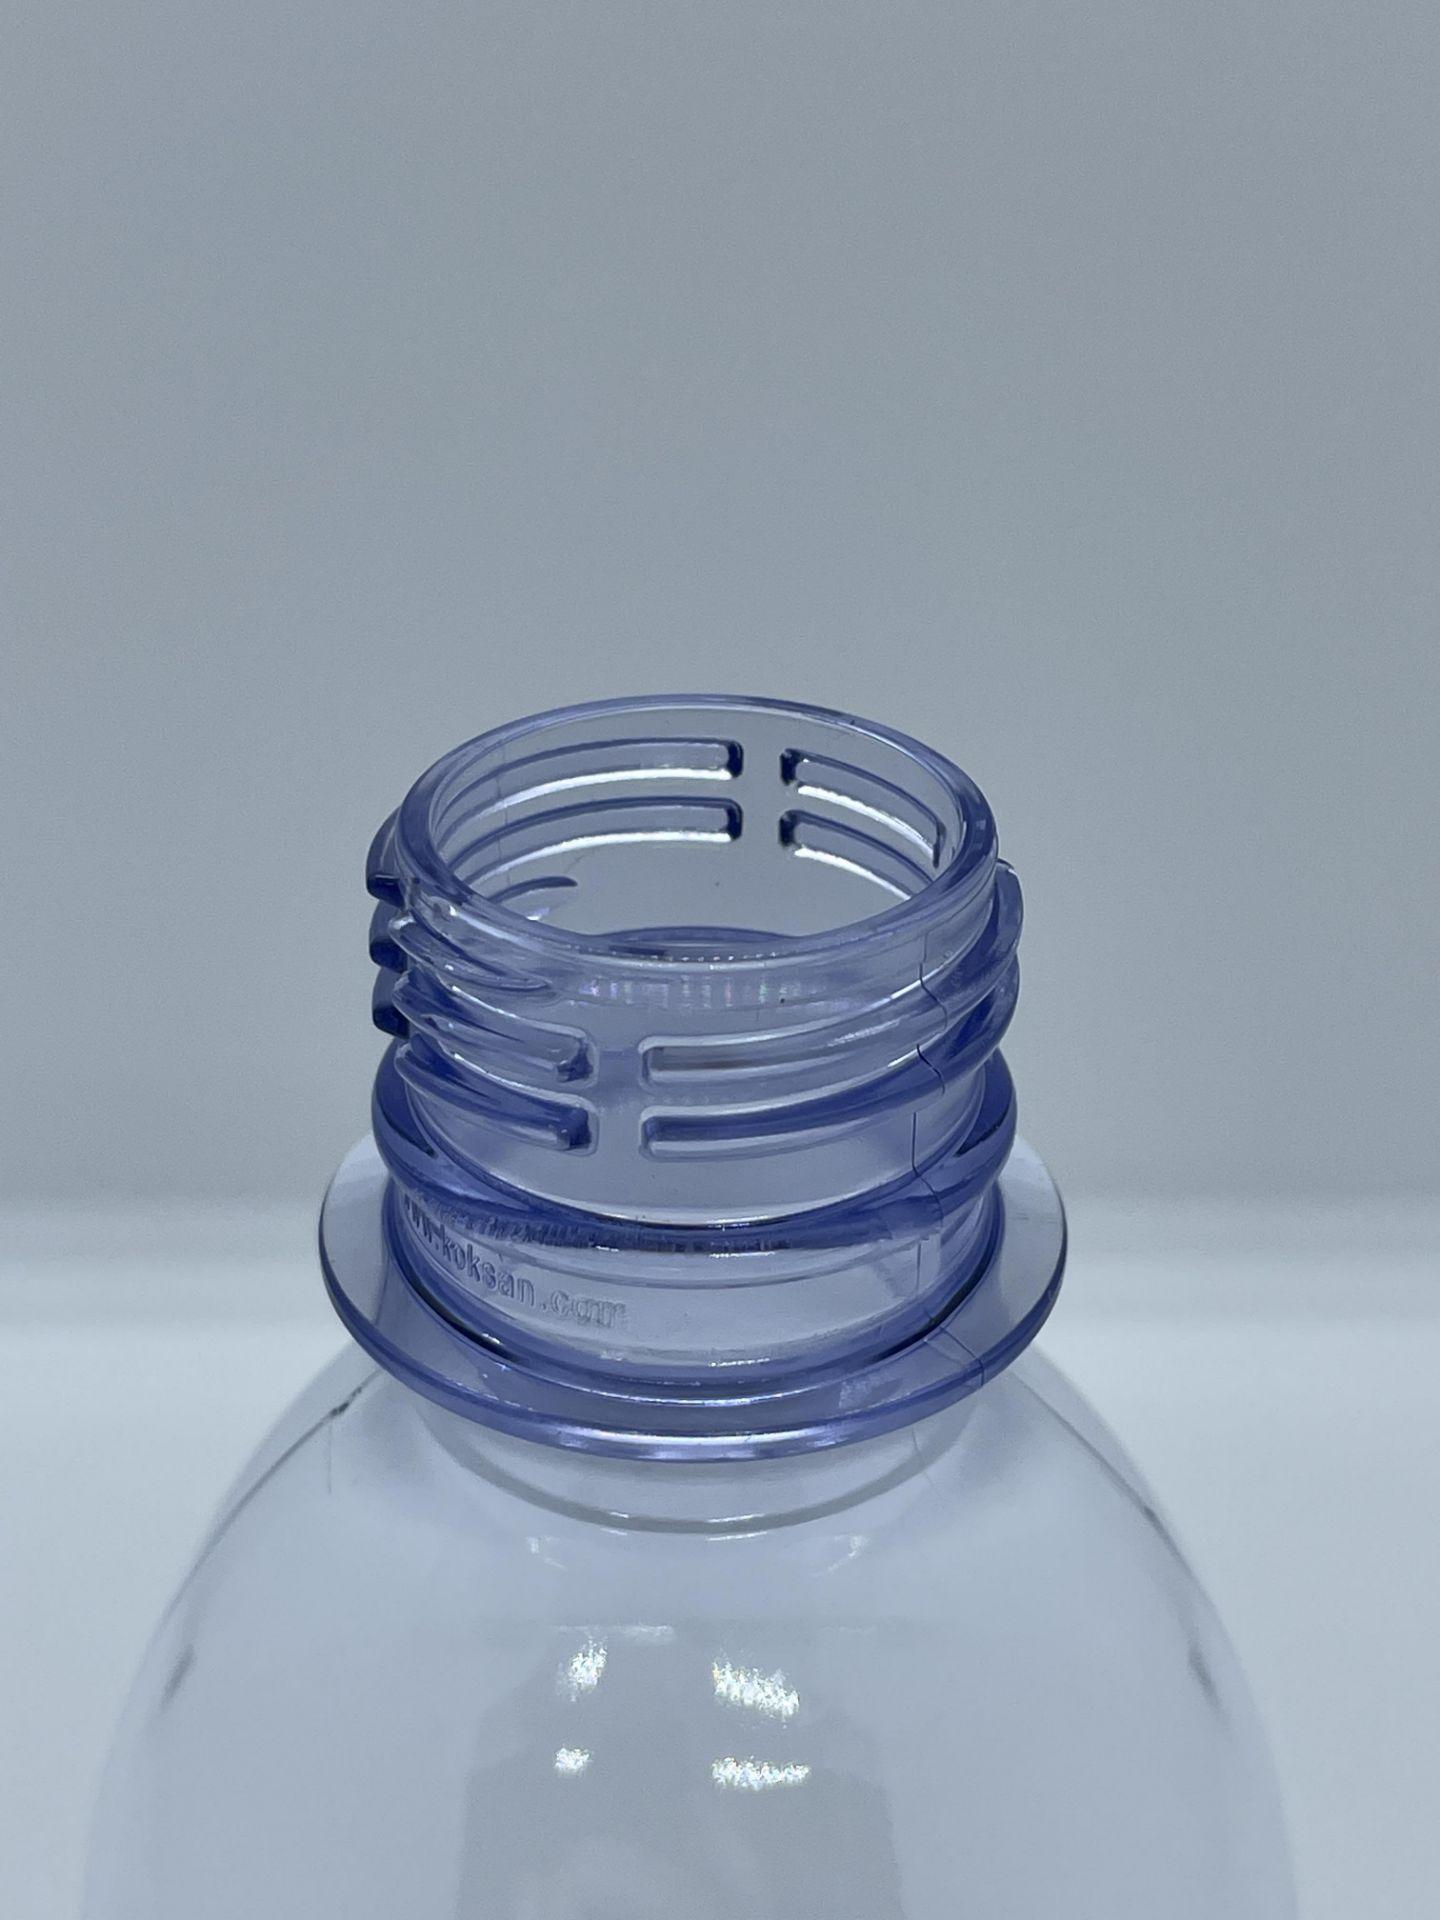 "158,000 - 8 oz Empty Plastic Bottles, Neck Threading 28-410, 5.25"" Tall x 2.25"" Diameter - Image 3 of 5"